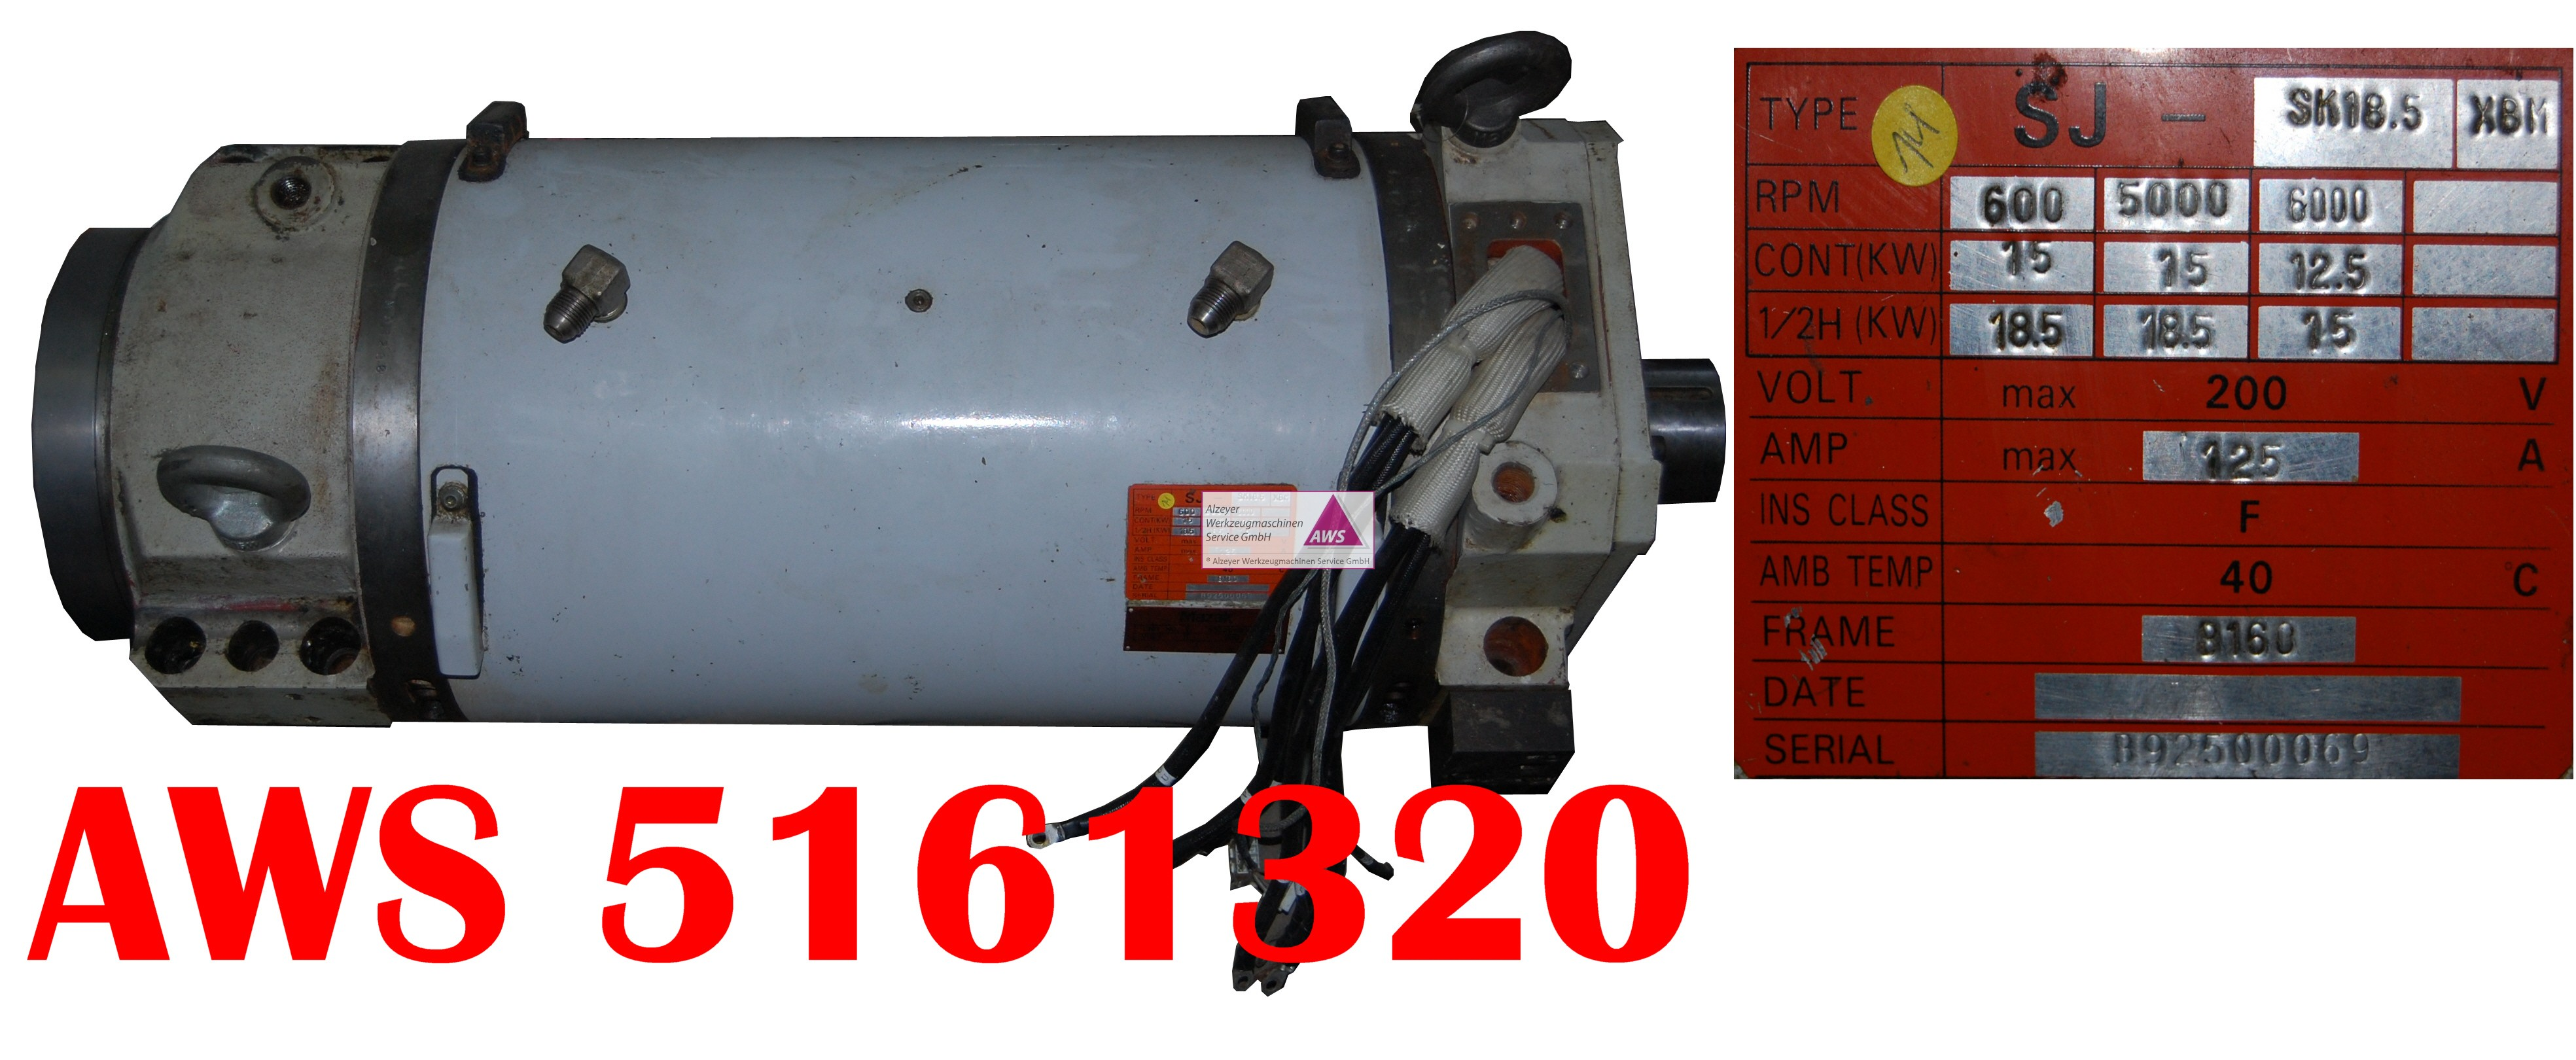 Spindelmotor komplett SJ-SK18.5 XBM SQT15M***